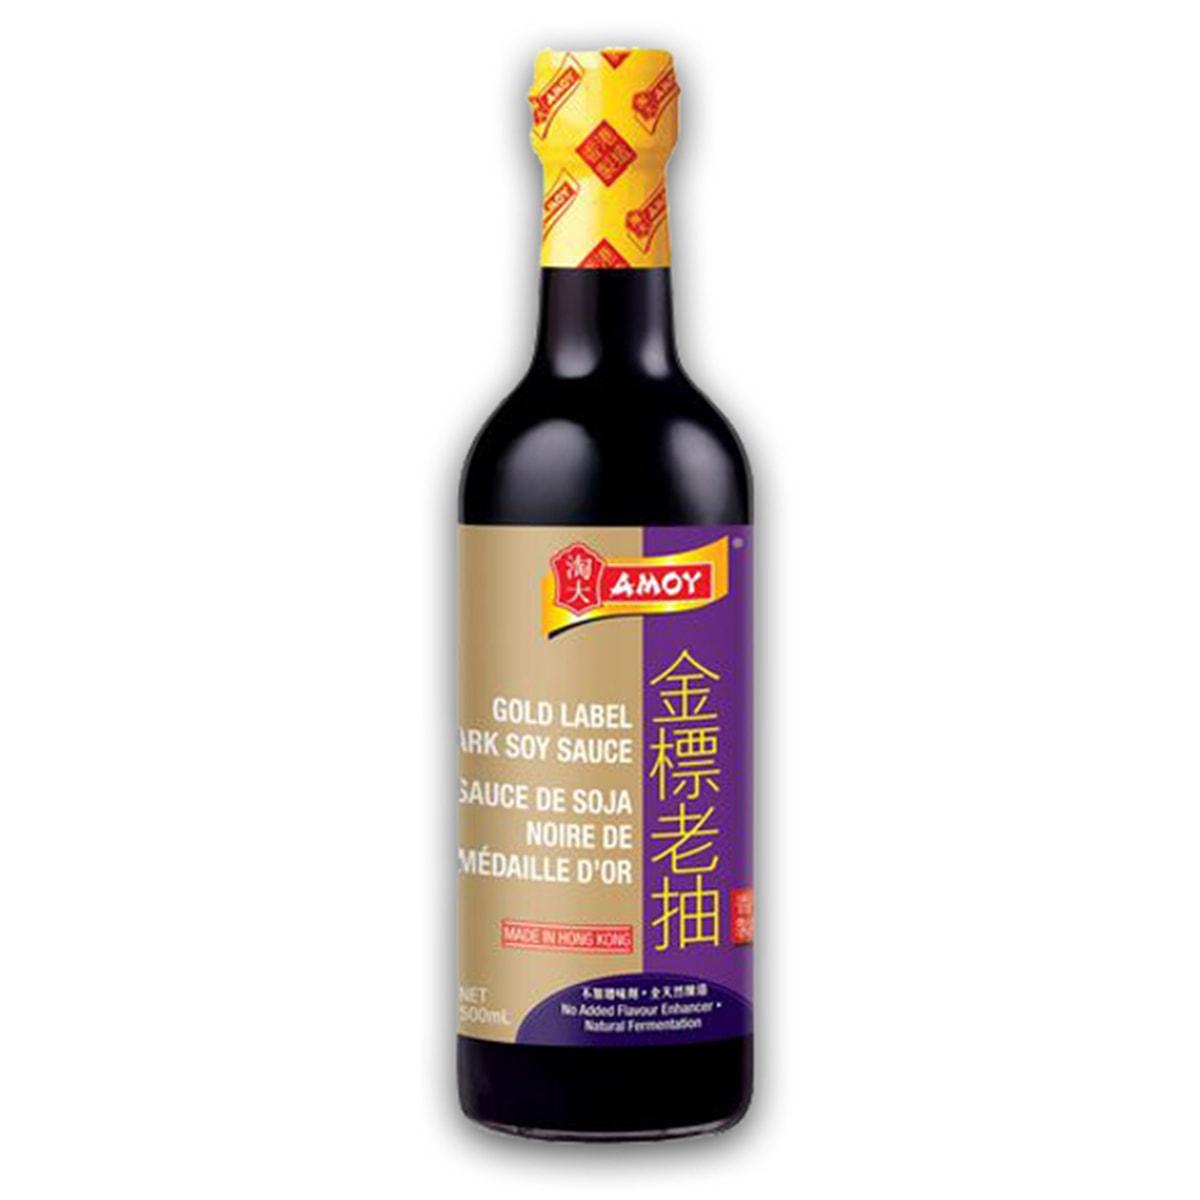 Buy Amoy Gold Label Dark Soy Sauce - 500 ml